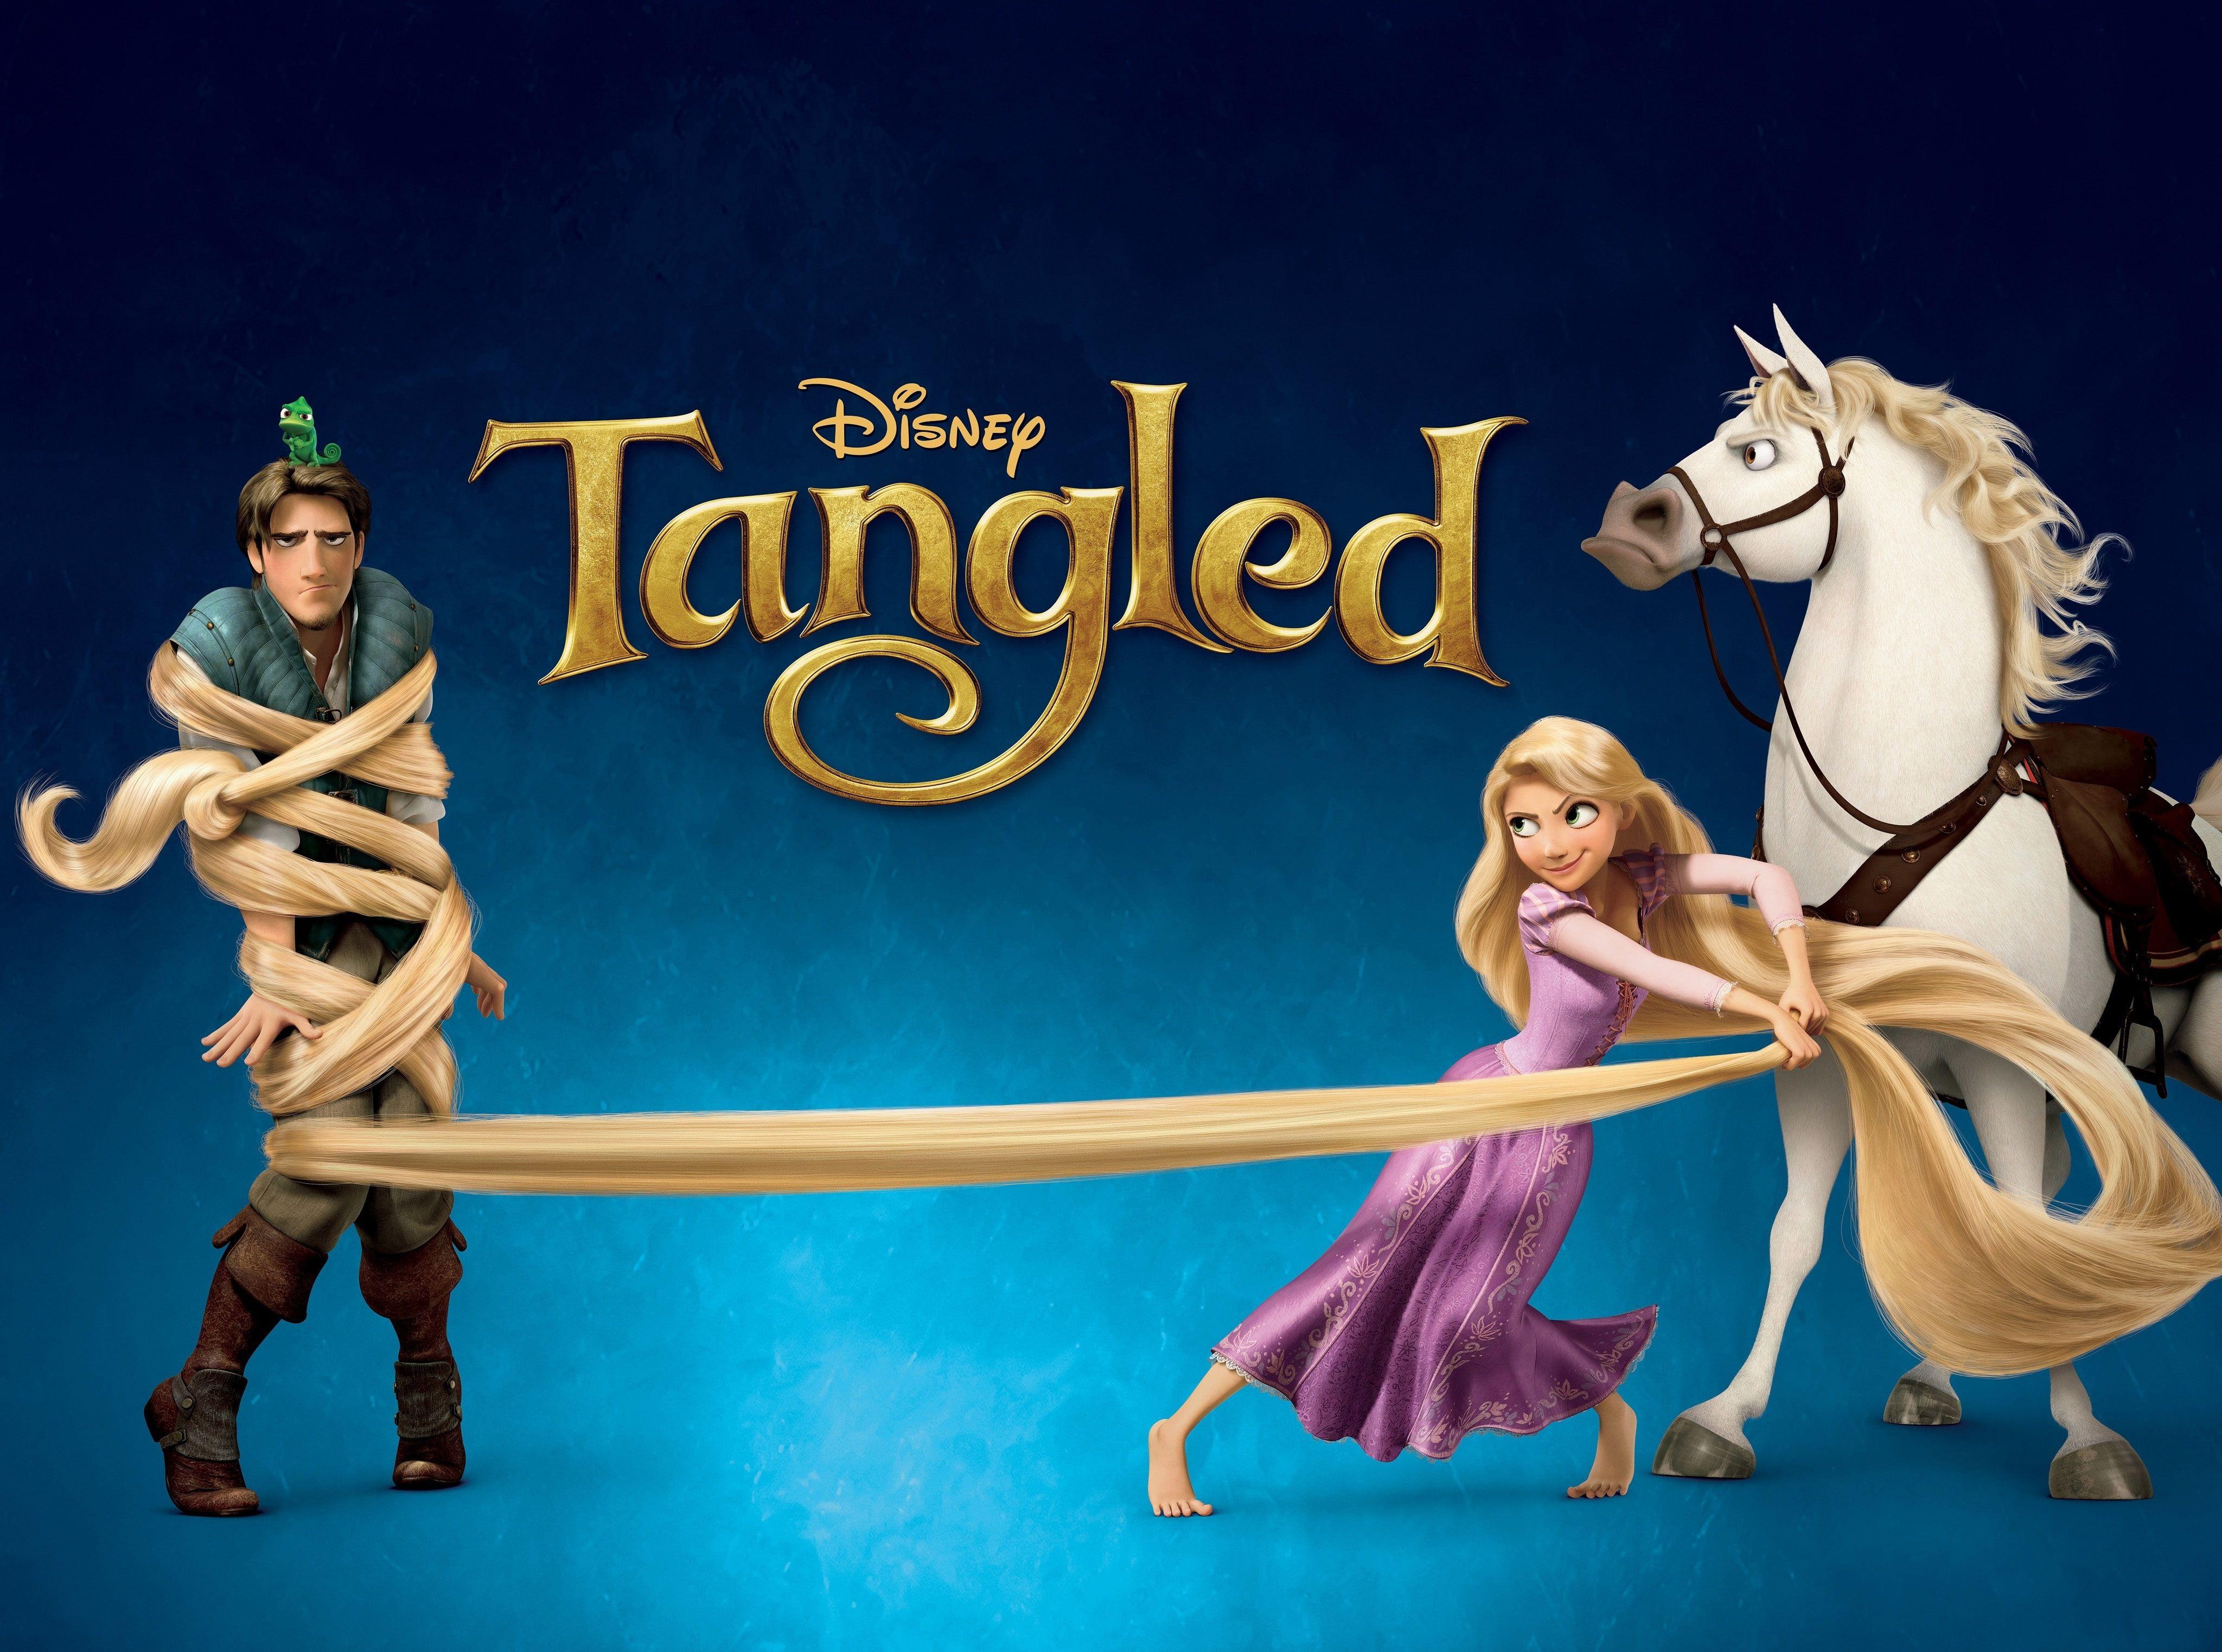 2010 Tangled Rapunzel Flynn Maximus Tangled Movie Poster Cartoons Tangled Tangled Rapunzel Maxi Tangled Movie Disney Tangled Disney Subliminal Messages